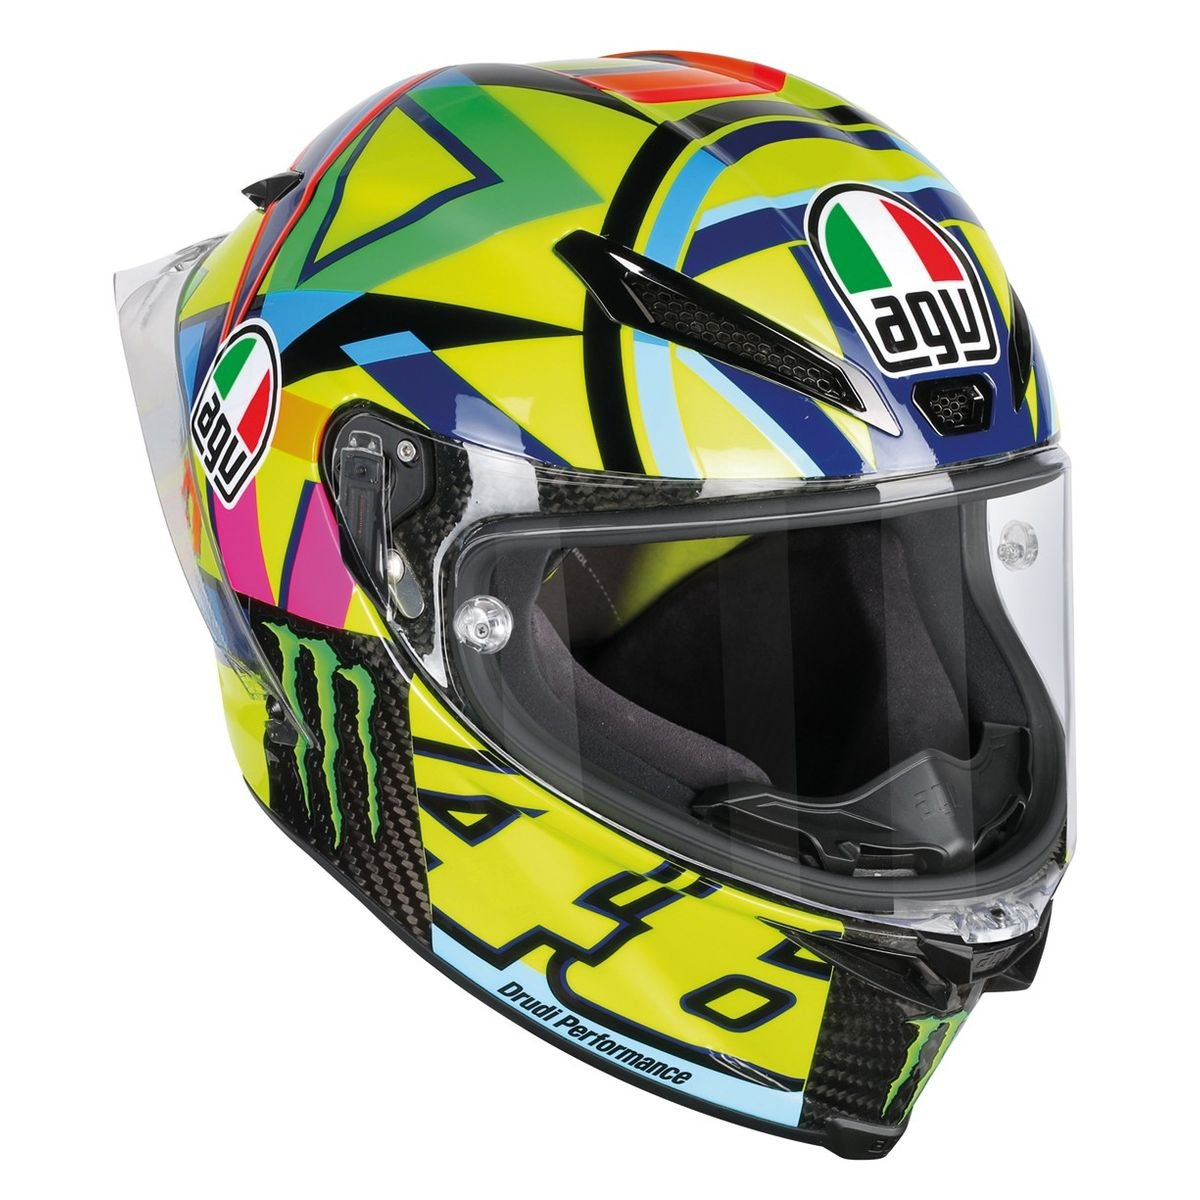 AGV Unisex-Adult Pista GP R Helmet-Soleluna 2016 (Large) (Multi